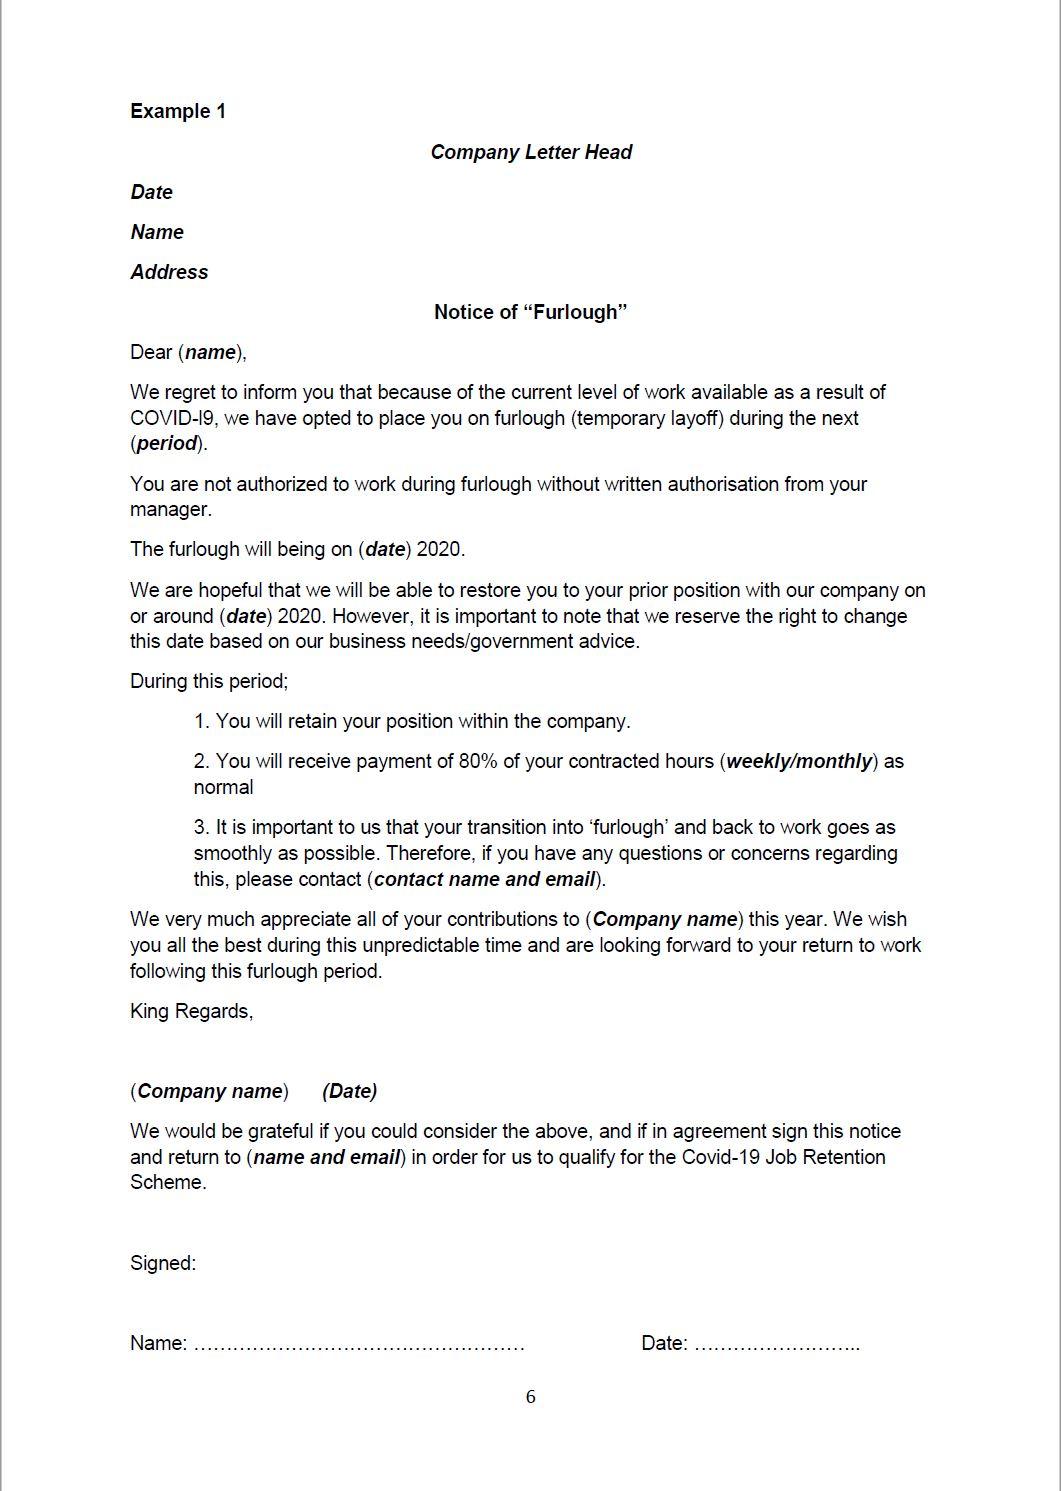 Return To Work Letter From Employer from grtglobal.com